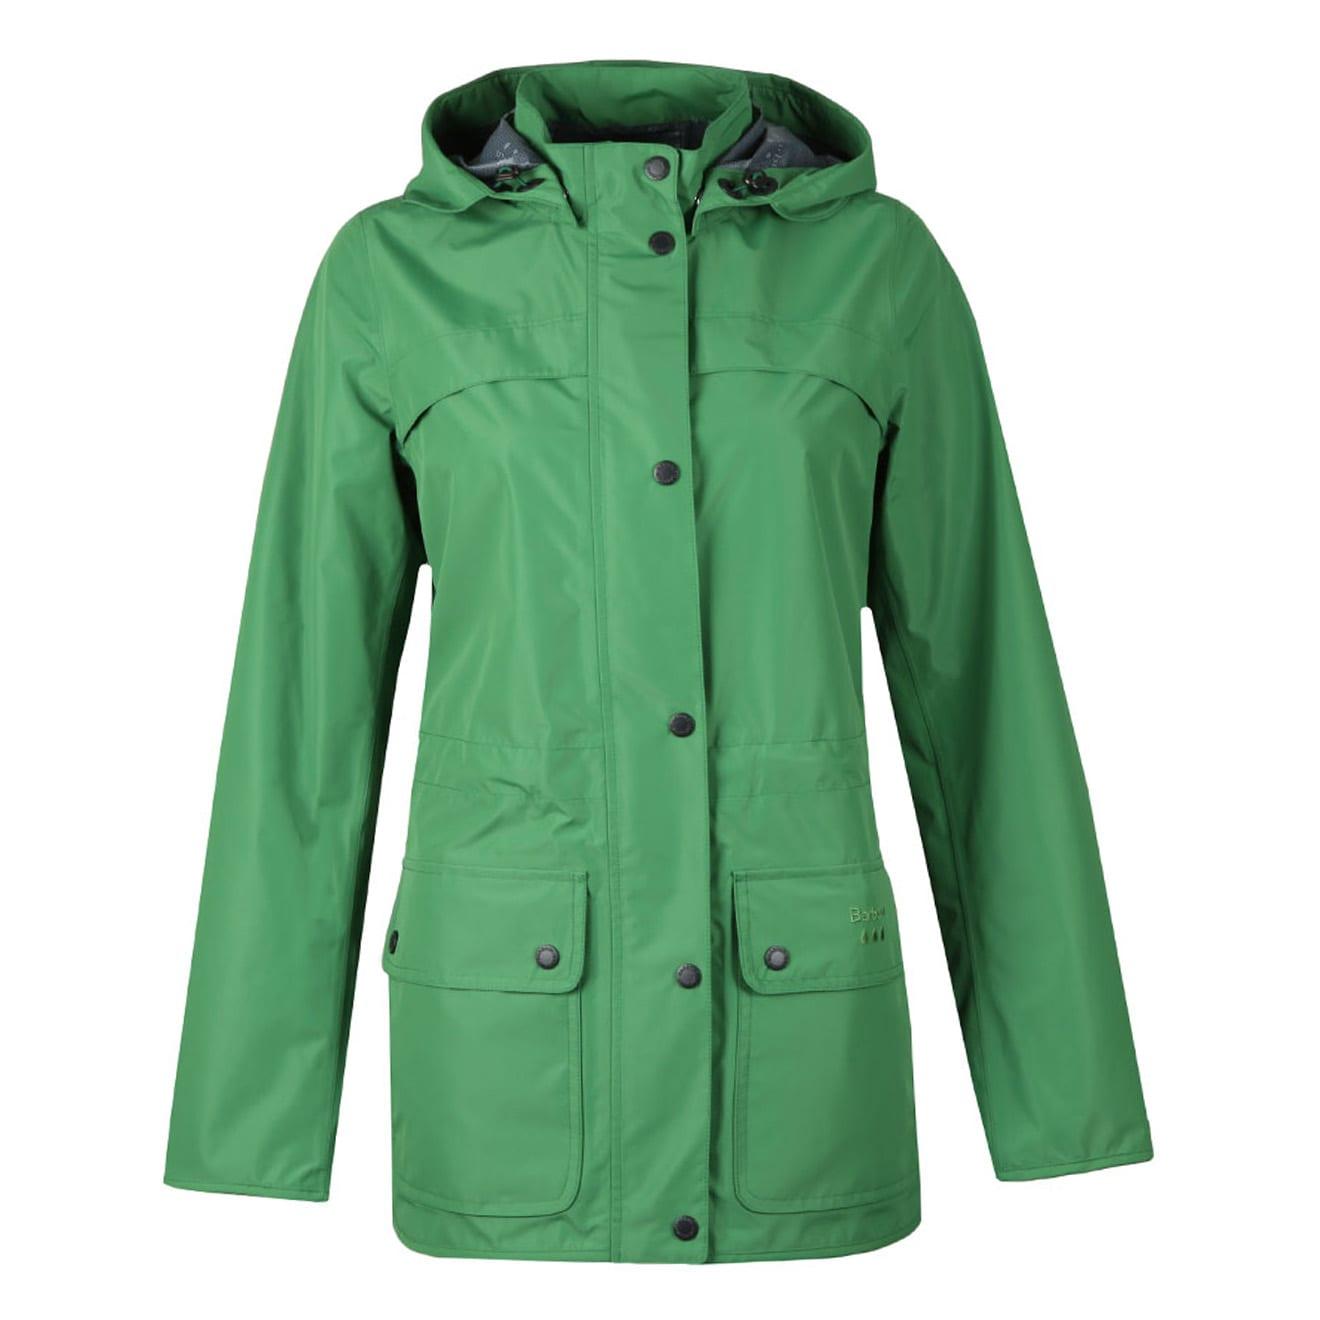 4bed86734 Barbour Womens Barometer Weather Comfort Jacket Clover